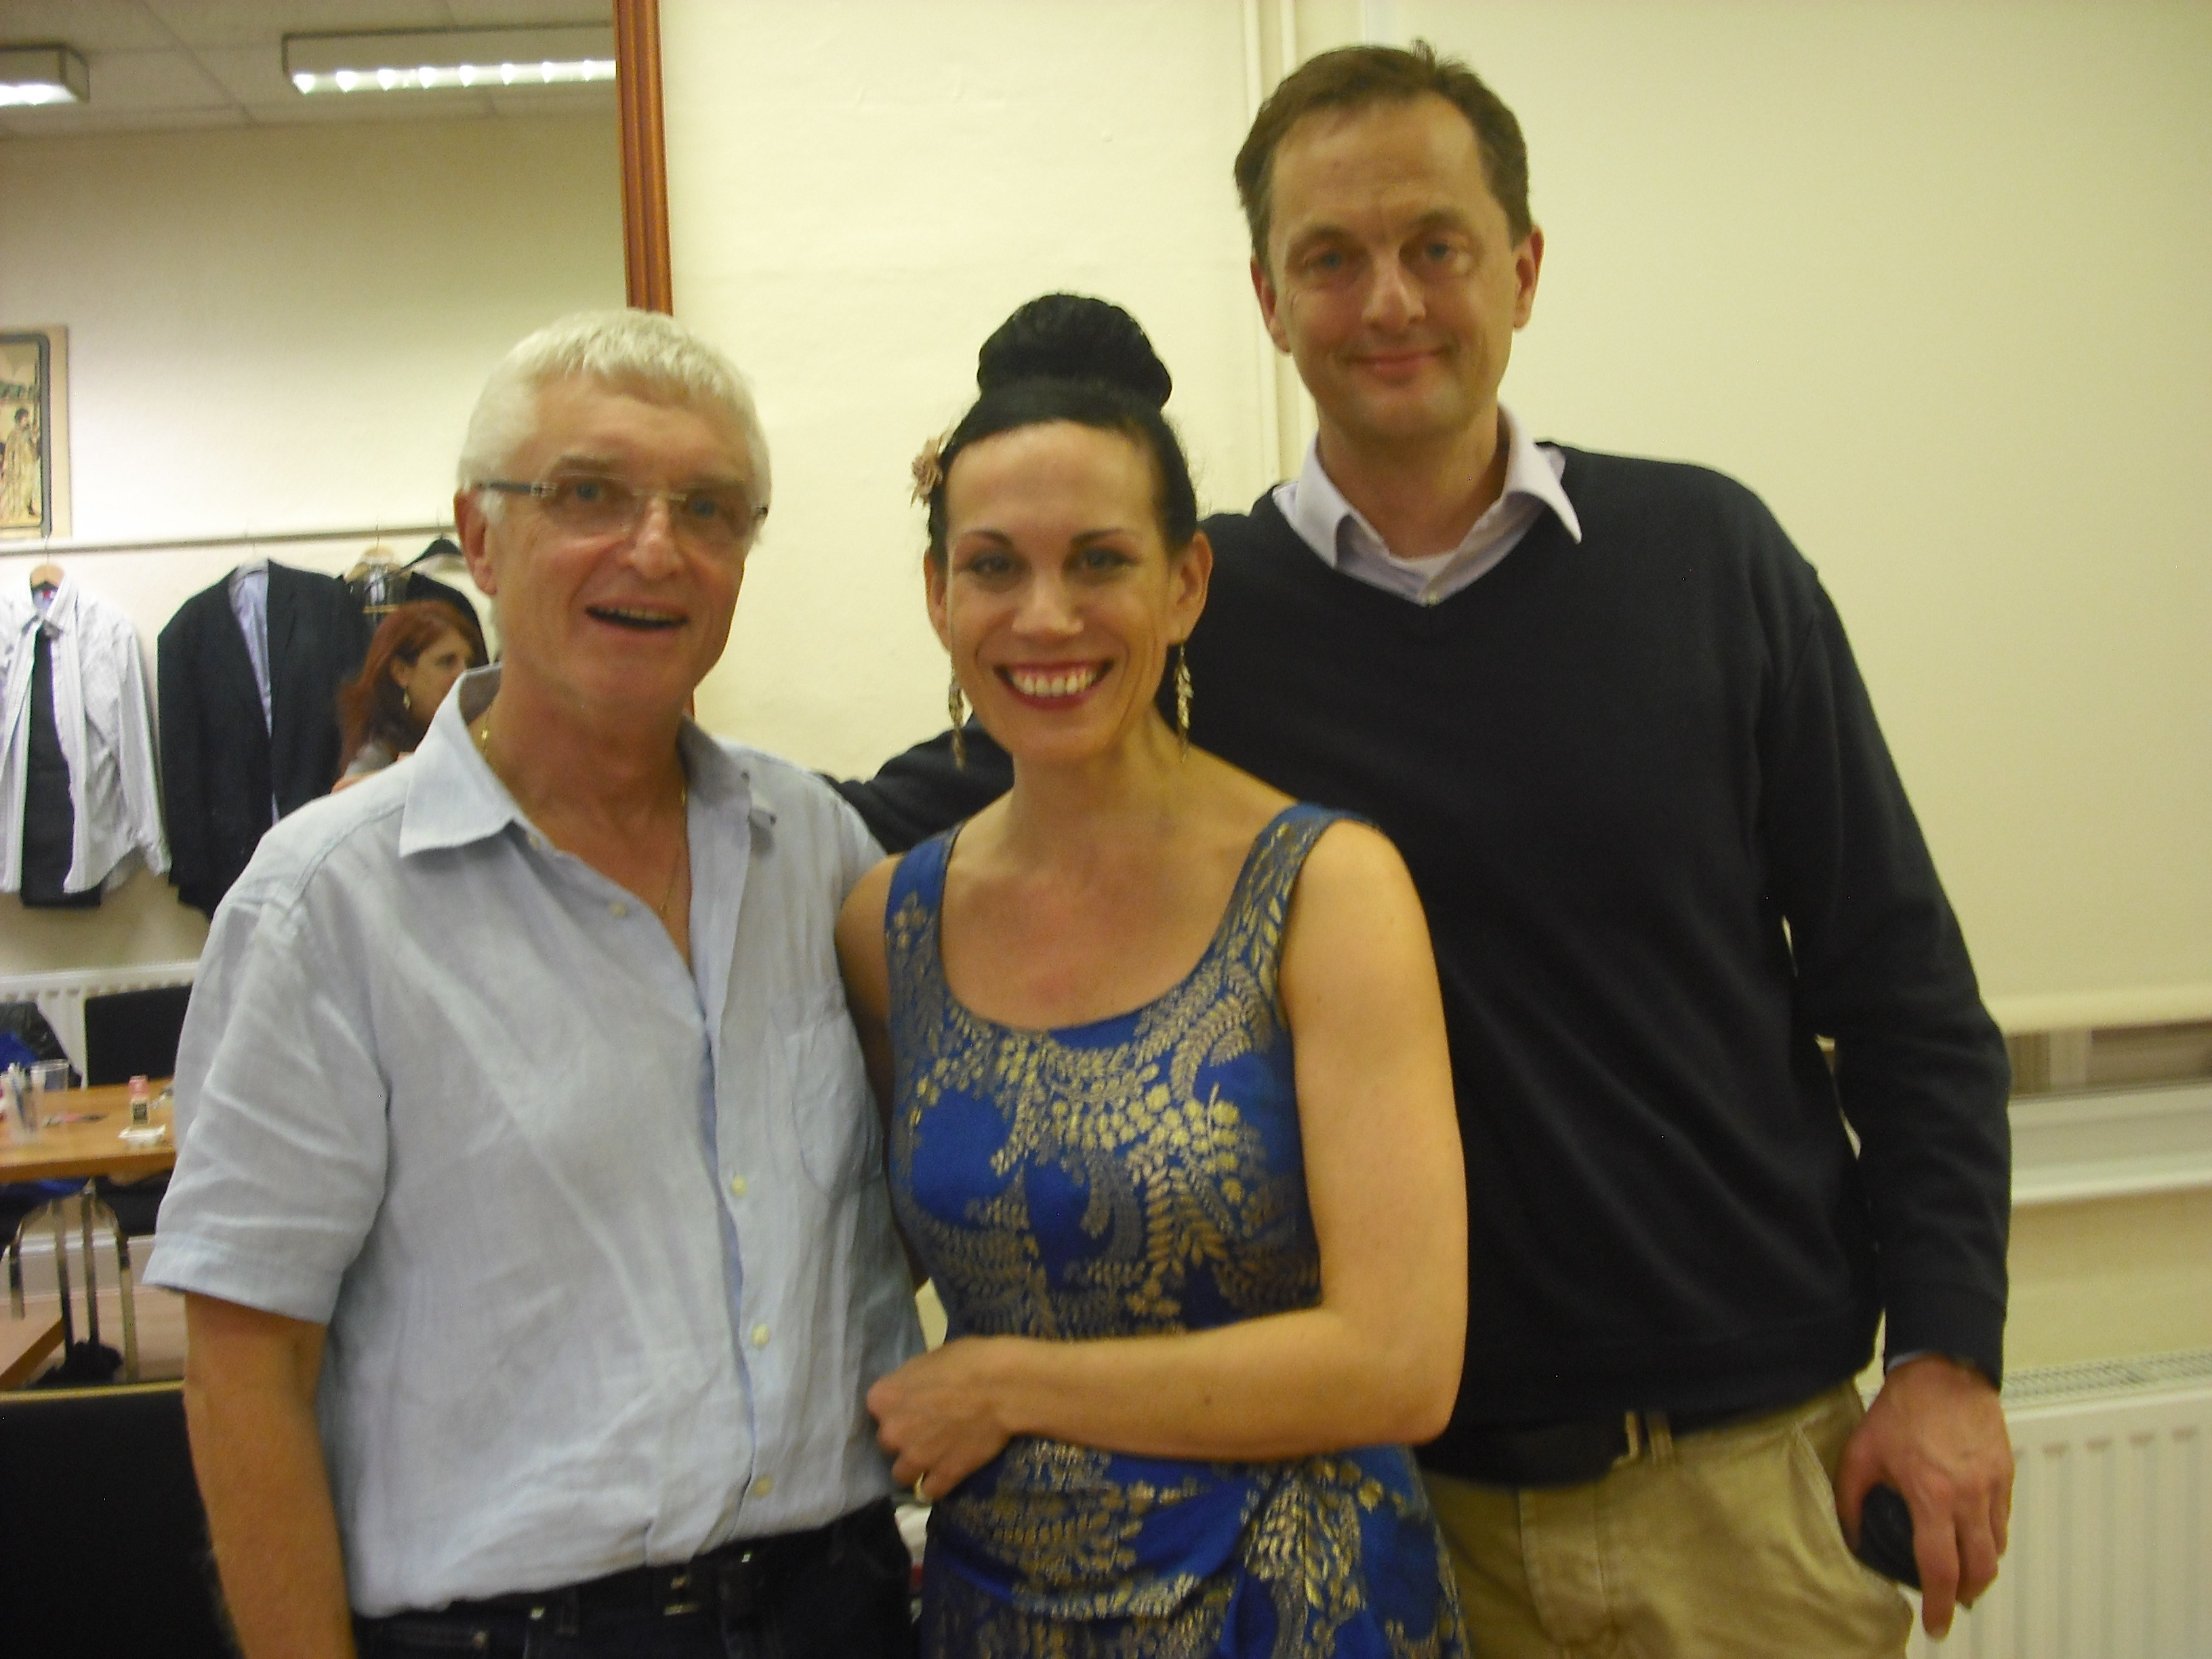 Marcus Lloyd with John Foreman and Christine Richardson